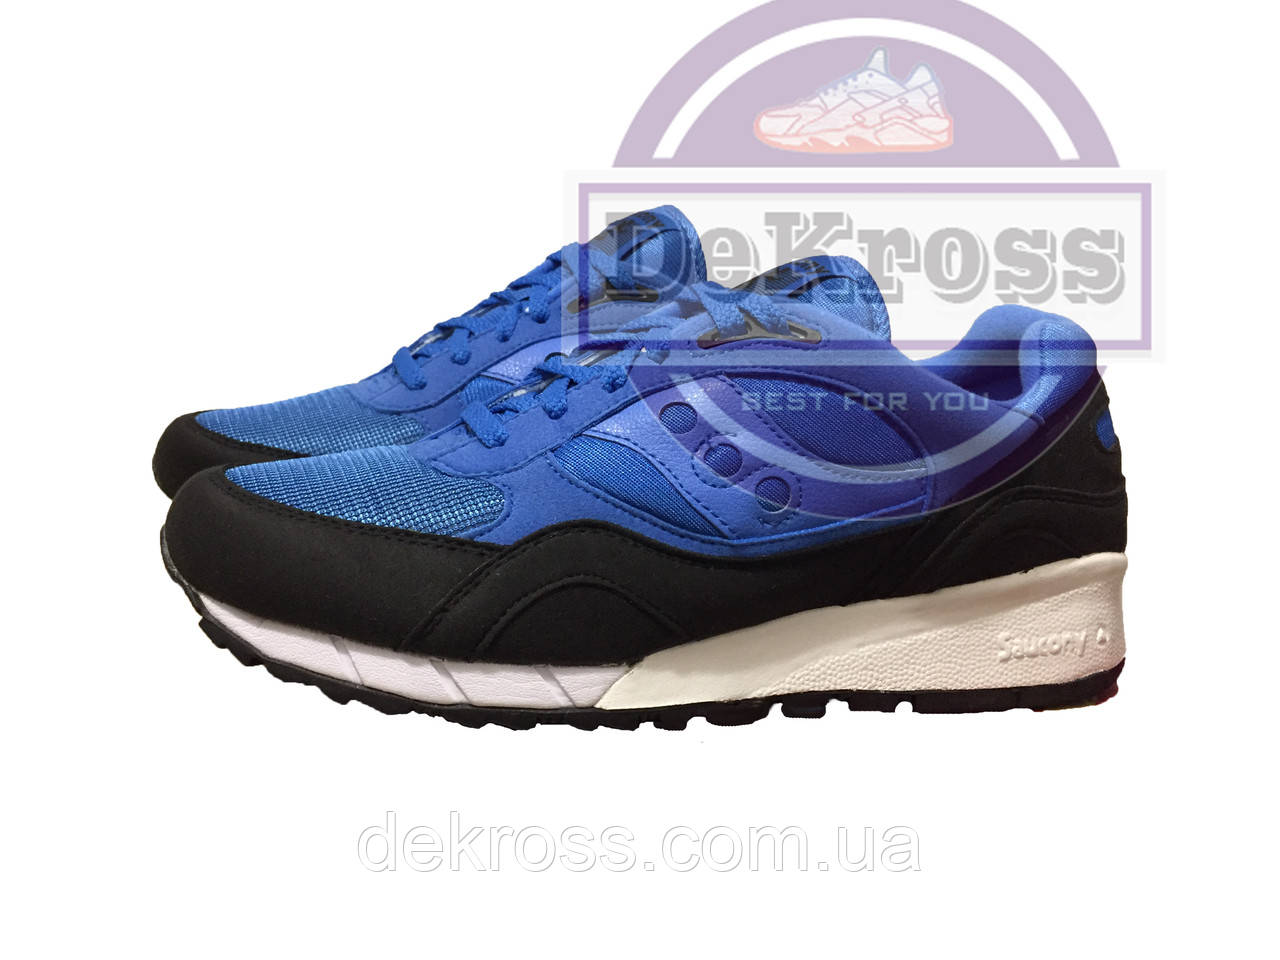 Кроссовки Saucony Shadow 6000 (Blue) Оригинал S70007